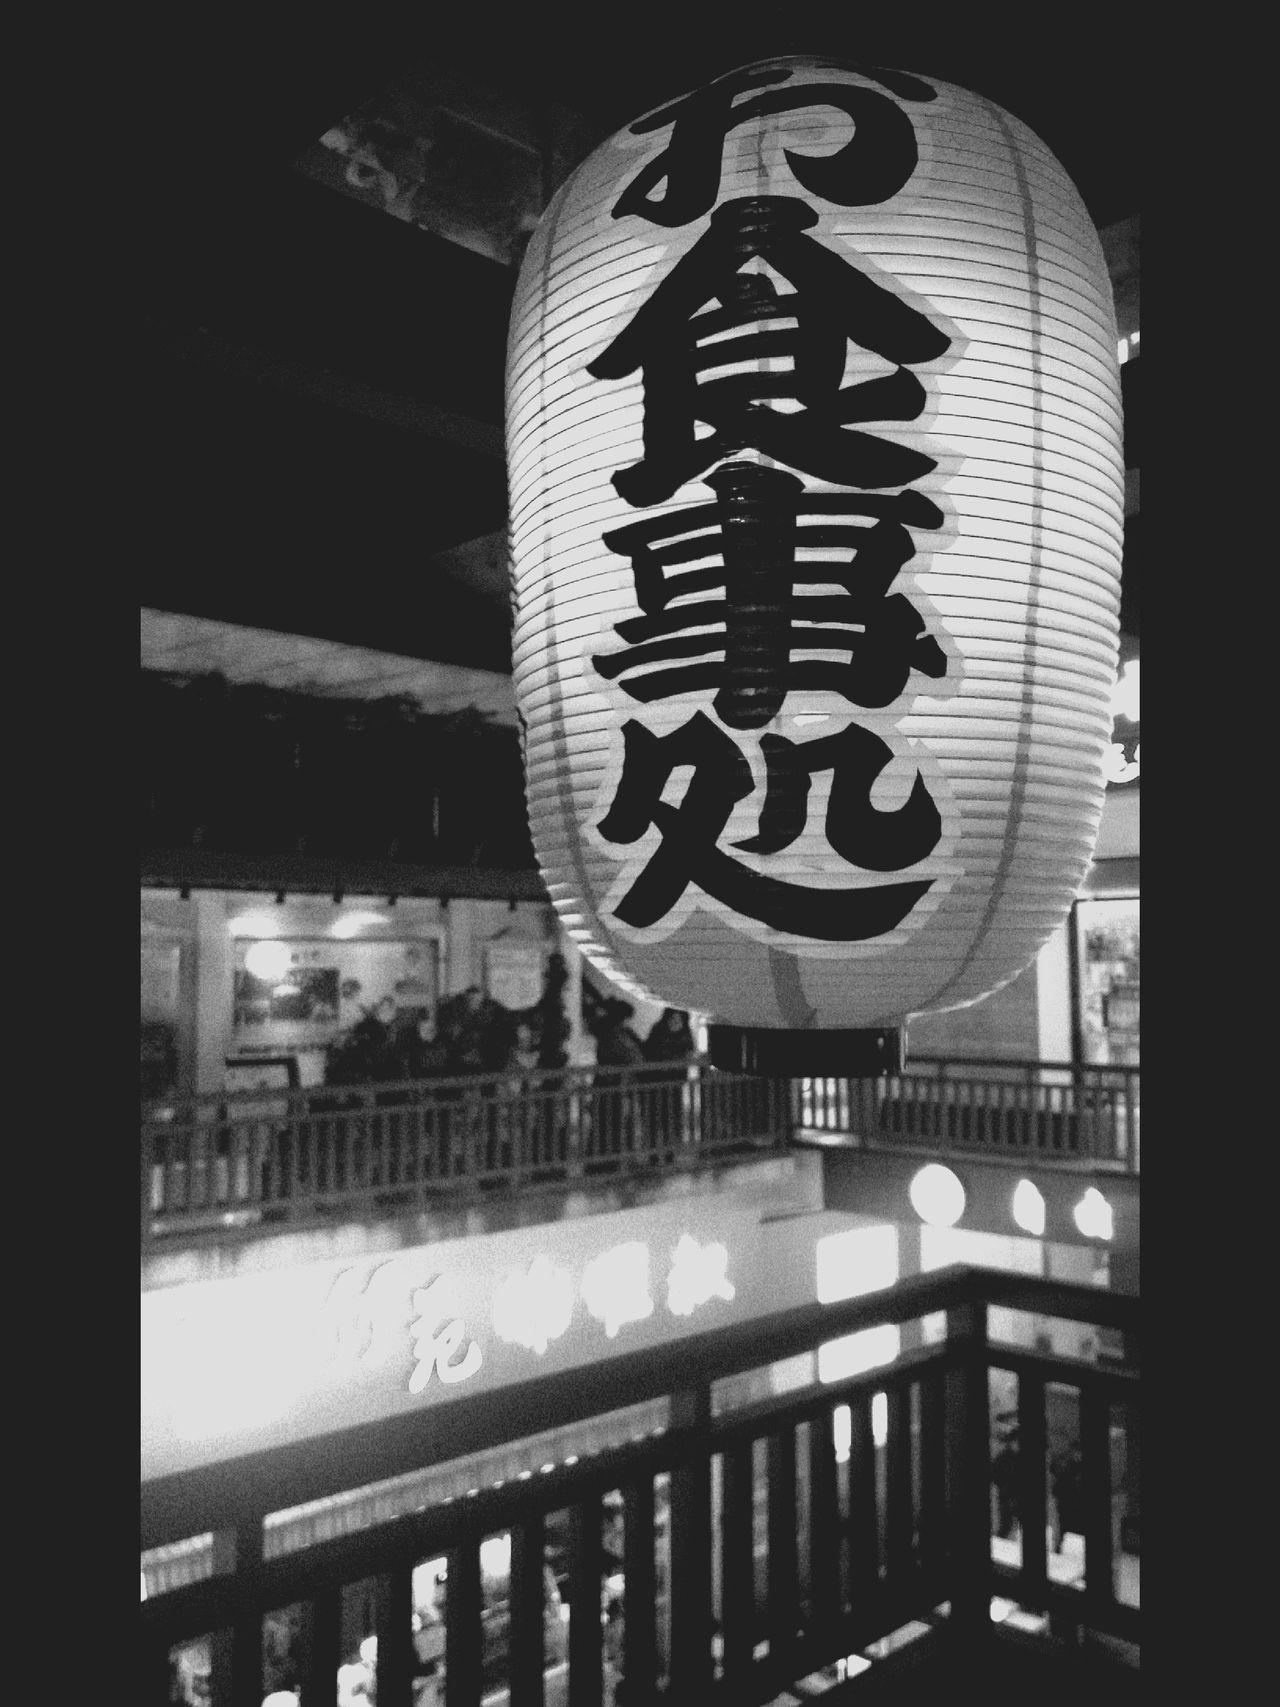 Chinese Lantern Festival Night Outdoors Close-up Architecture No People Illuminated Zhuhai Blackandwhite Photography Lantern